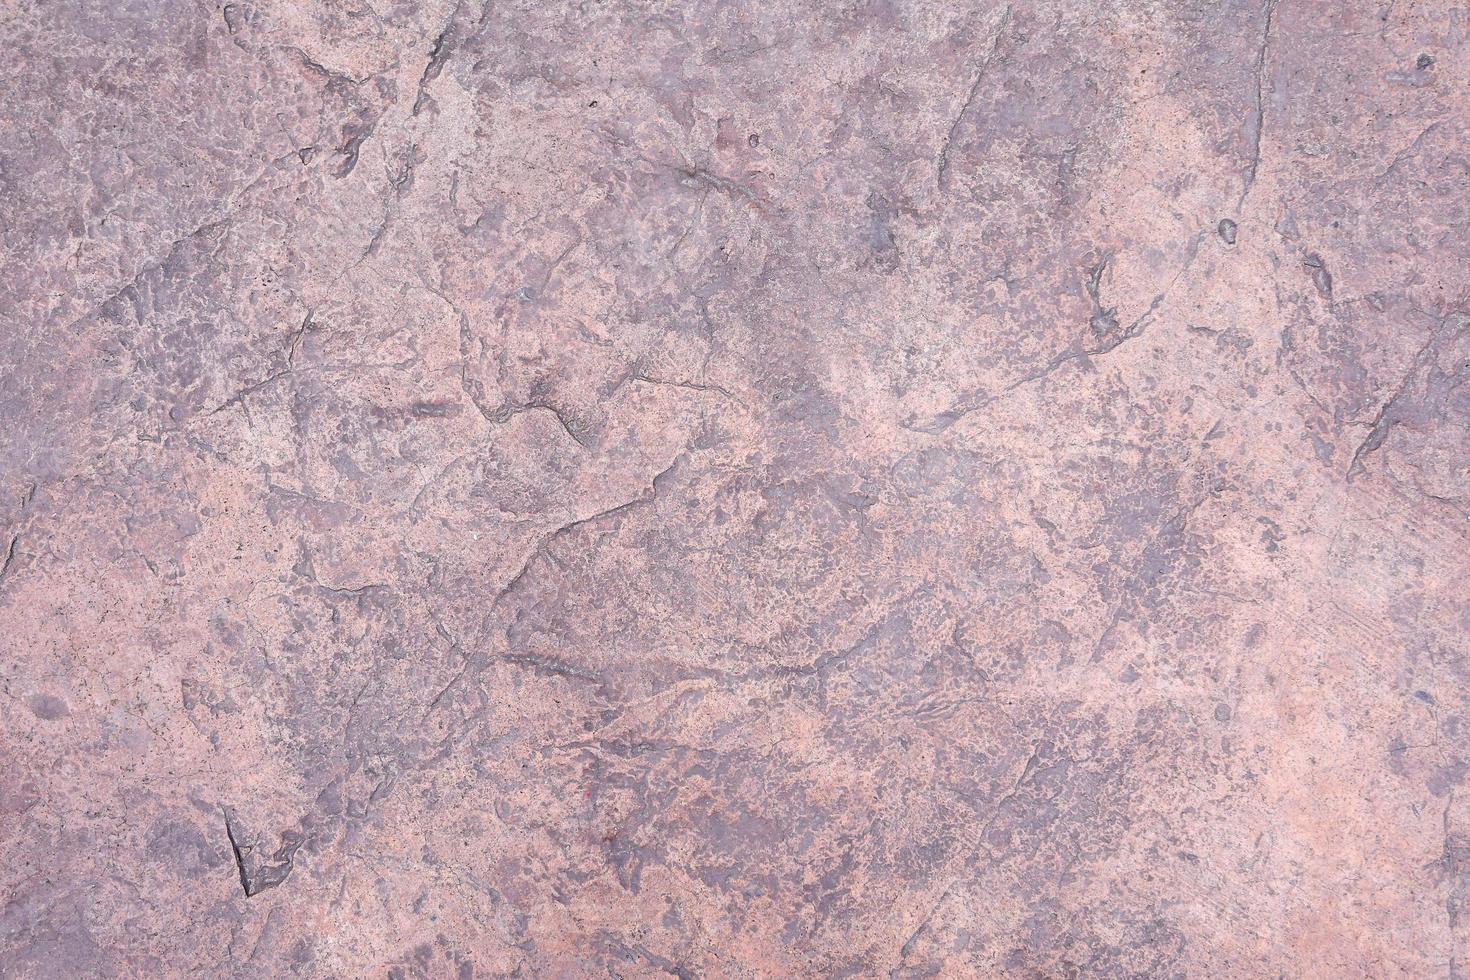 Fragmento de pared de crack resistido cemento viejo, textura de piso de concreto agrietado foto